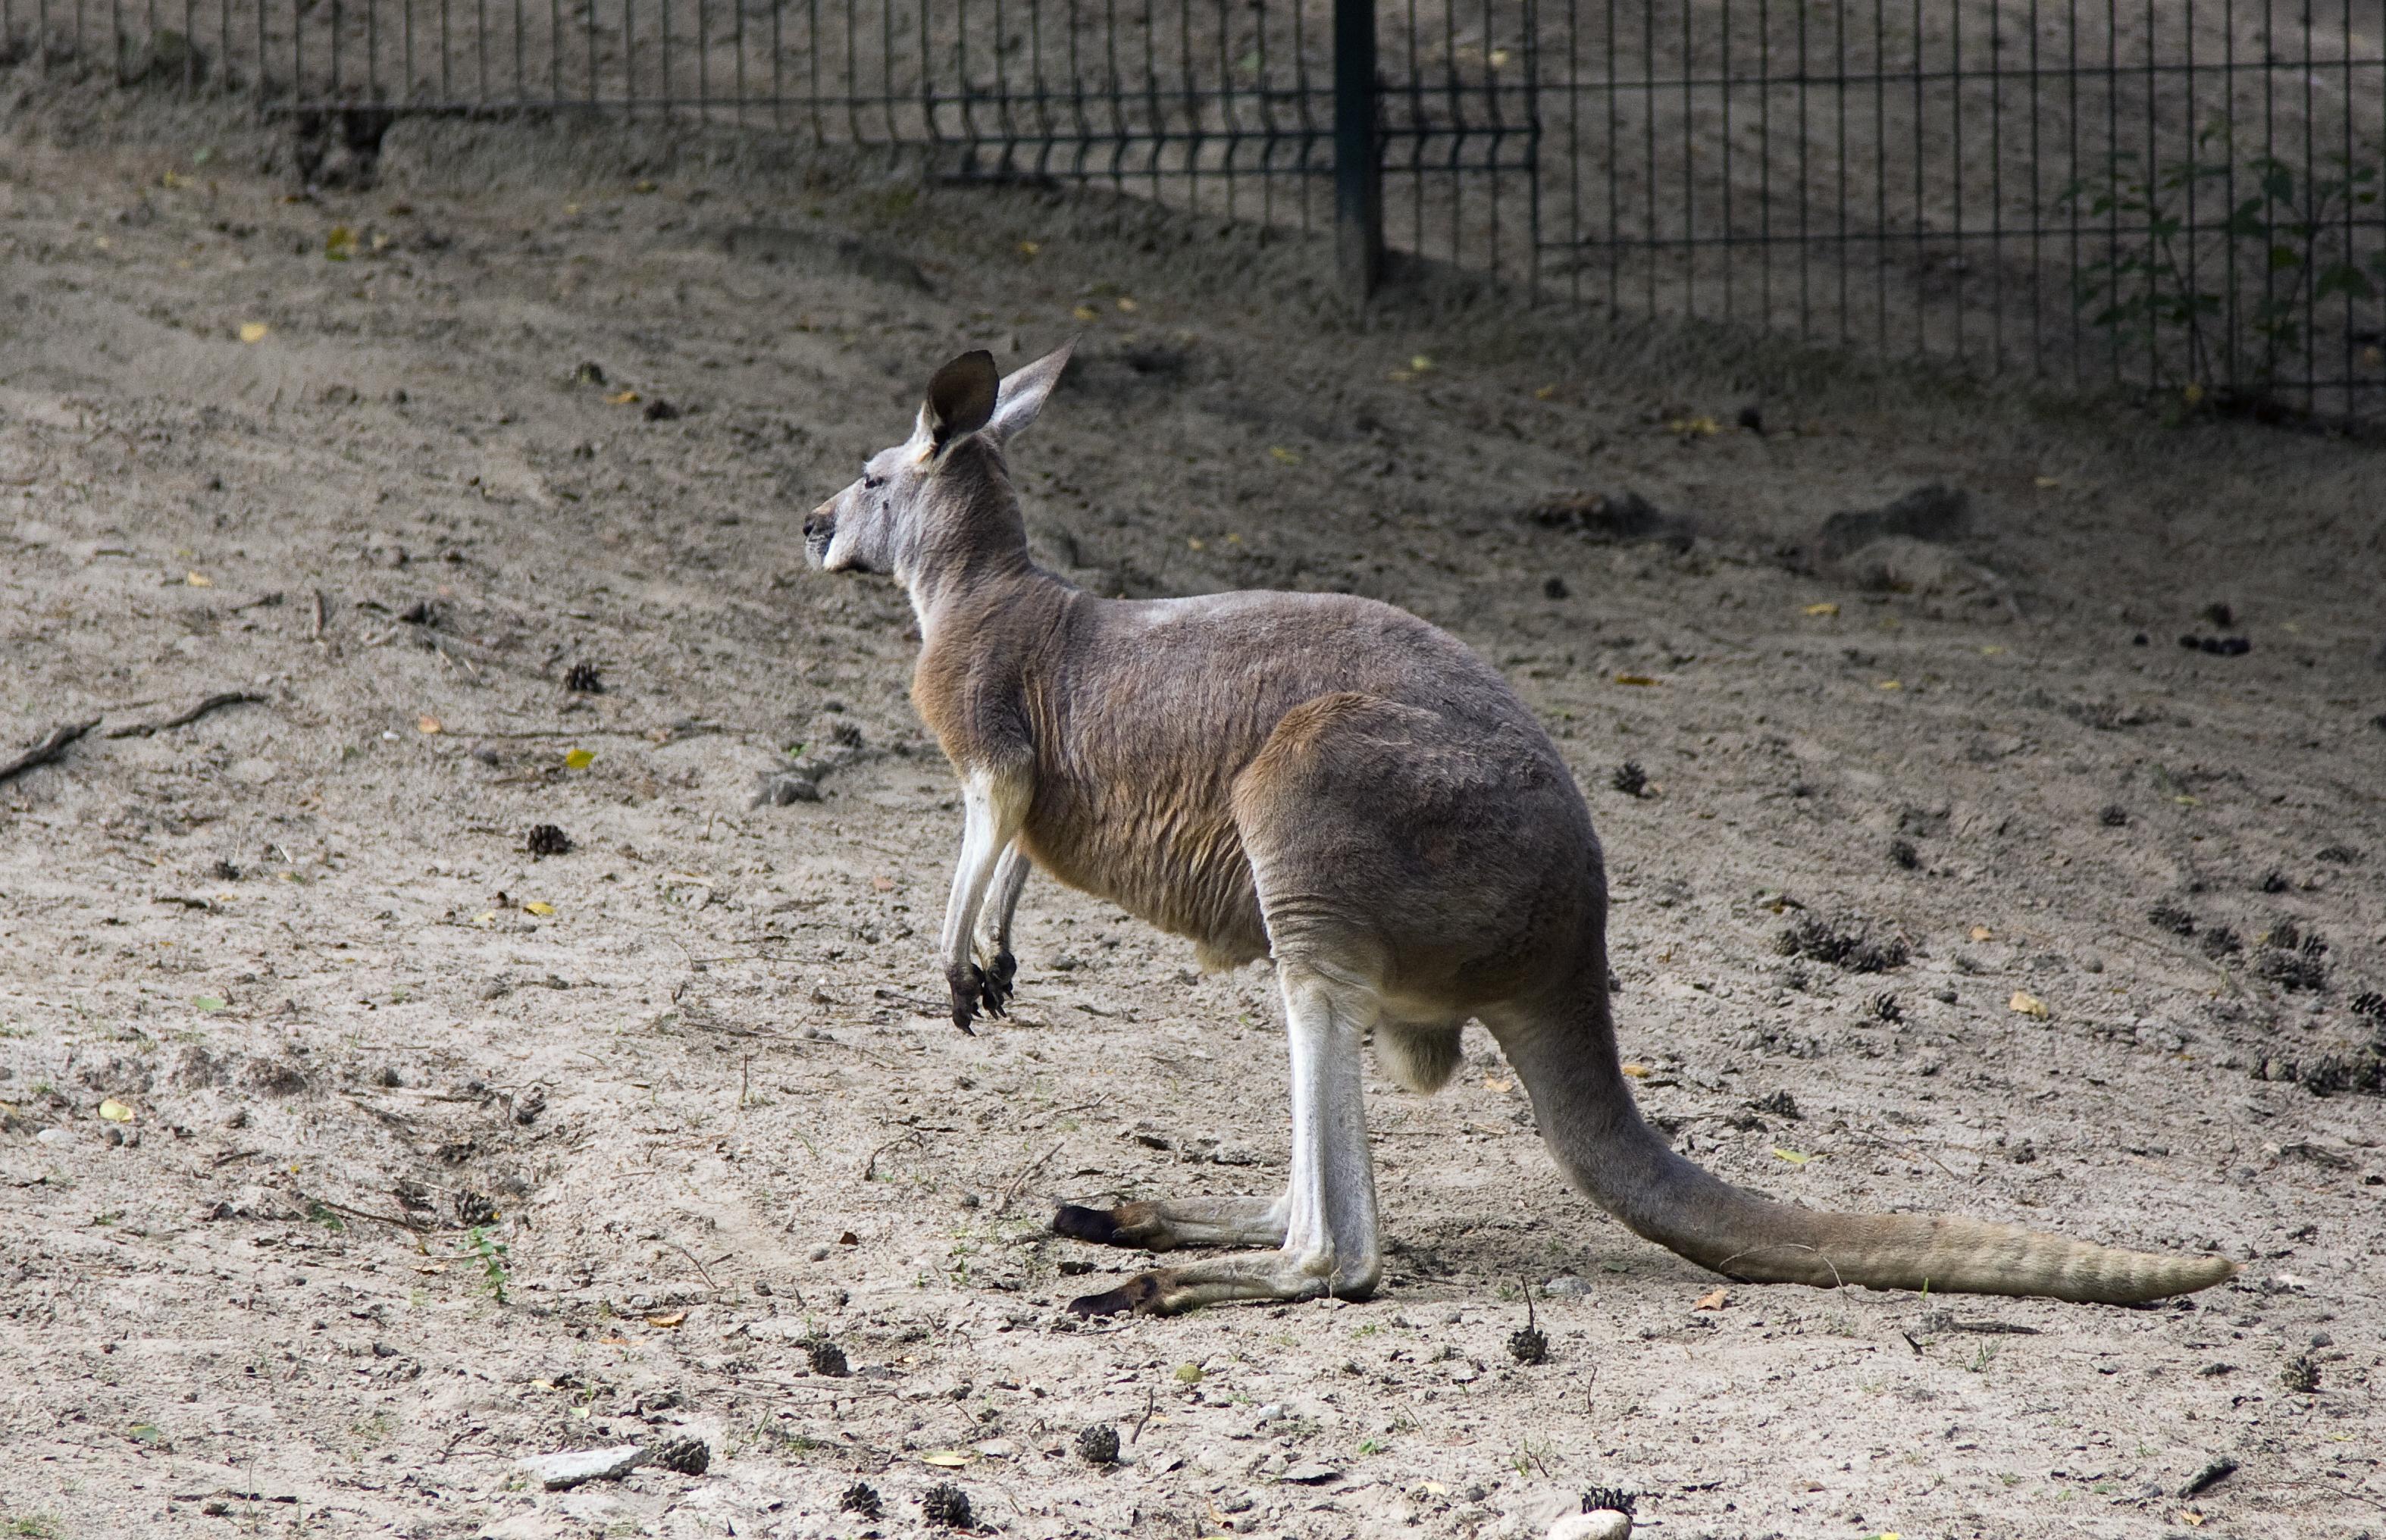 Kangaroo photo